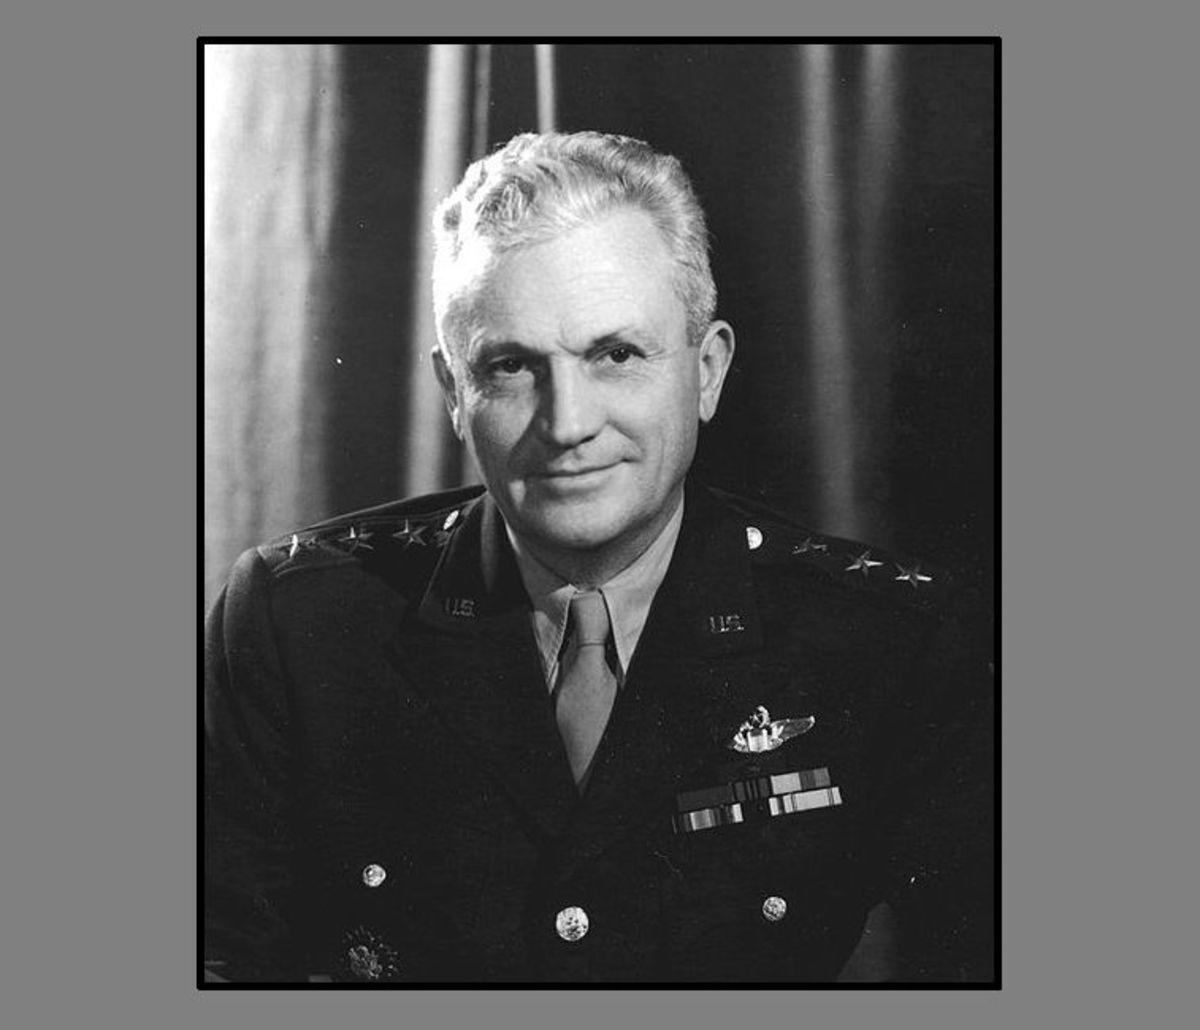 WWII: Lt. Gen. Frank Maxwell Andrews